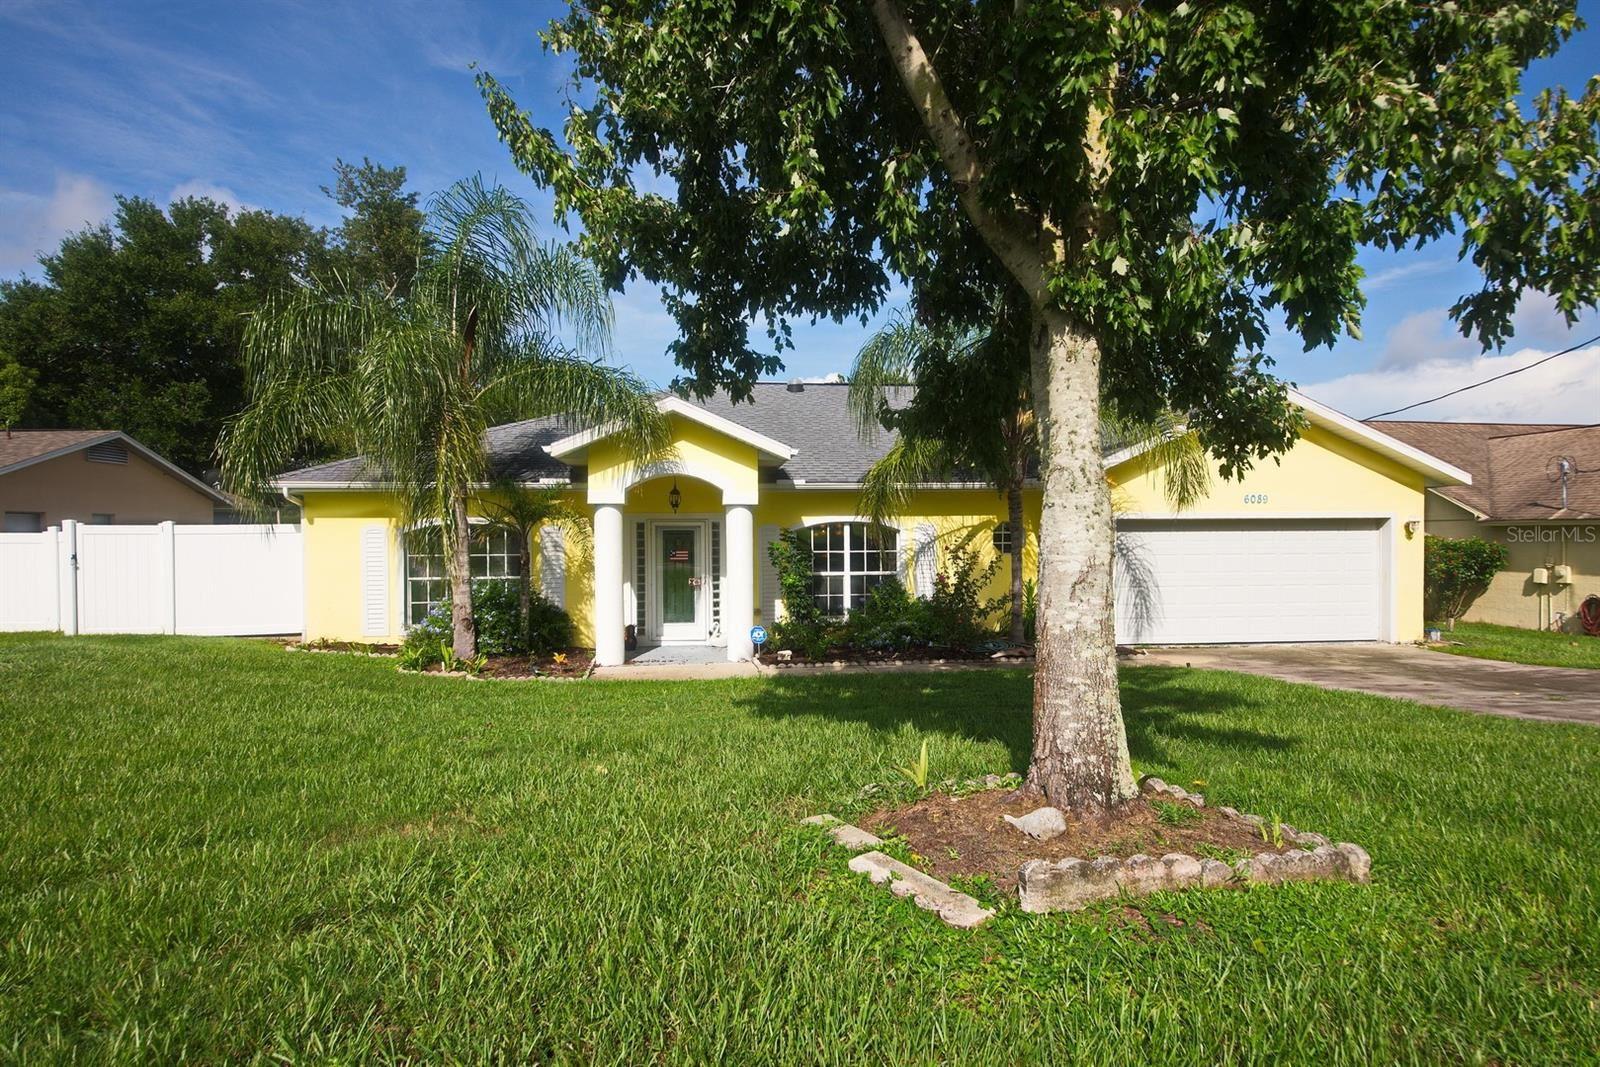 6089 MOUNTAIN WAY AVENUE, Spring Hill, FL 34608 - #: U8134063